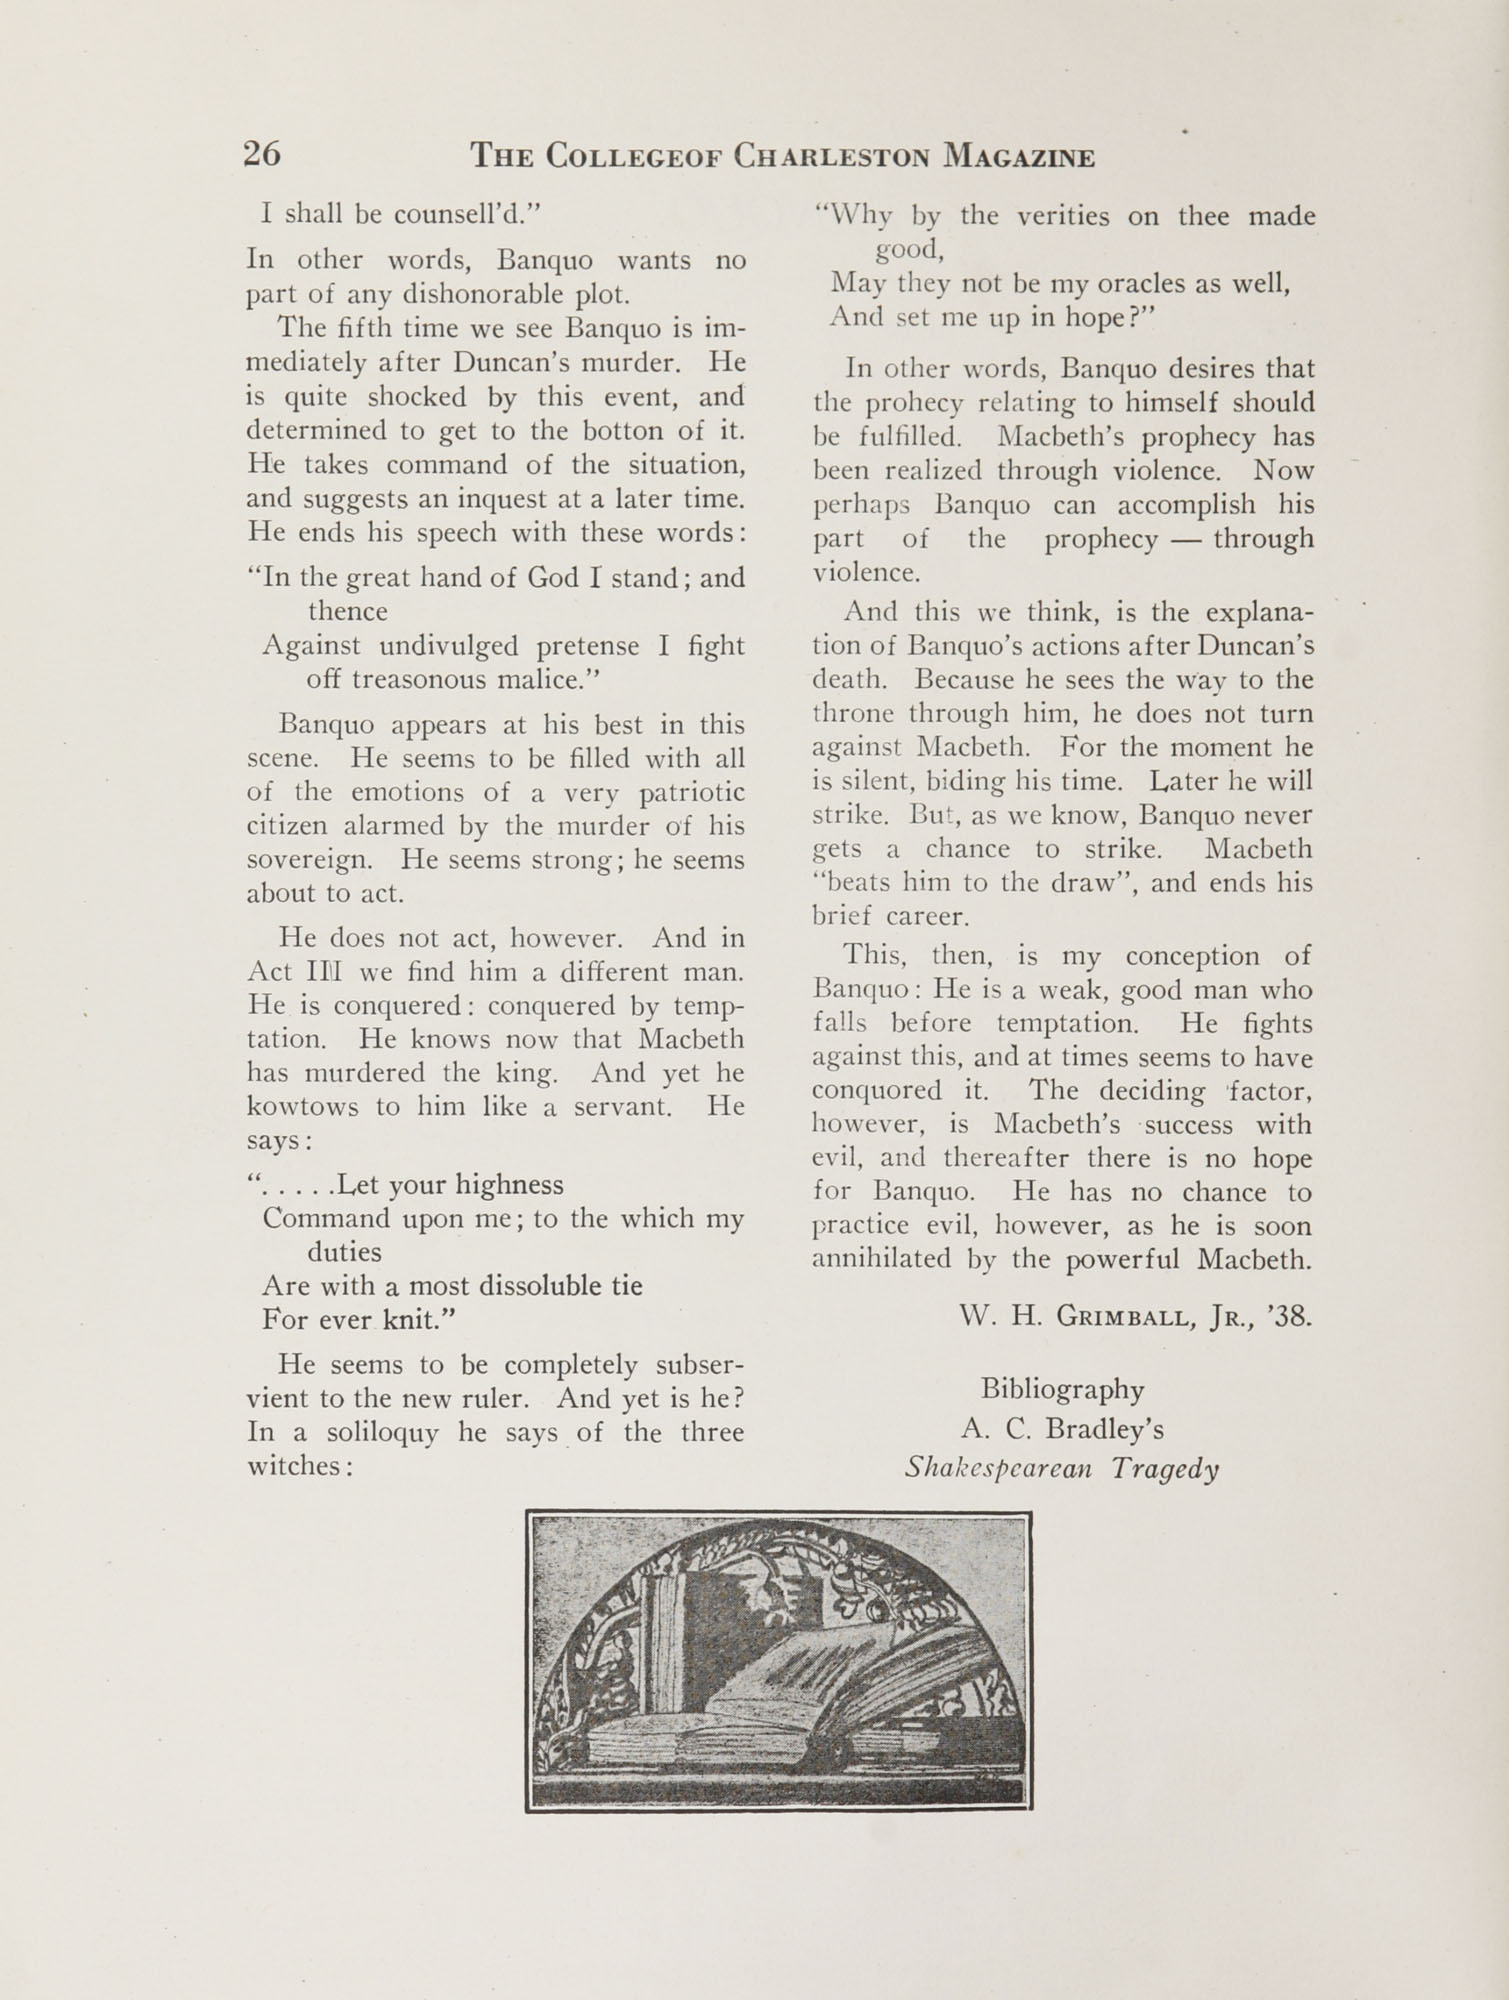 College of Charleston Magazine, 1937-1938, Vol. XXXXI No. 1, page 26